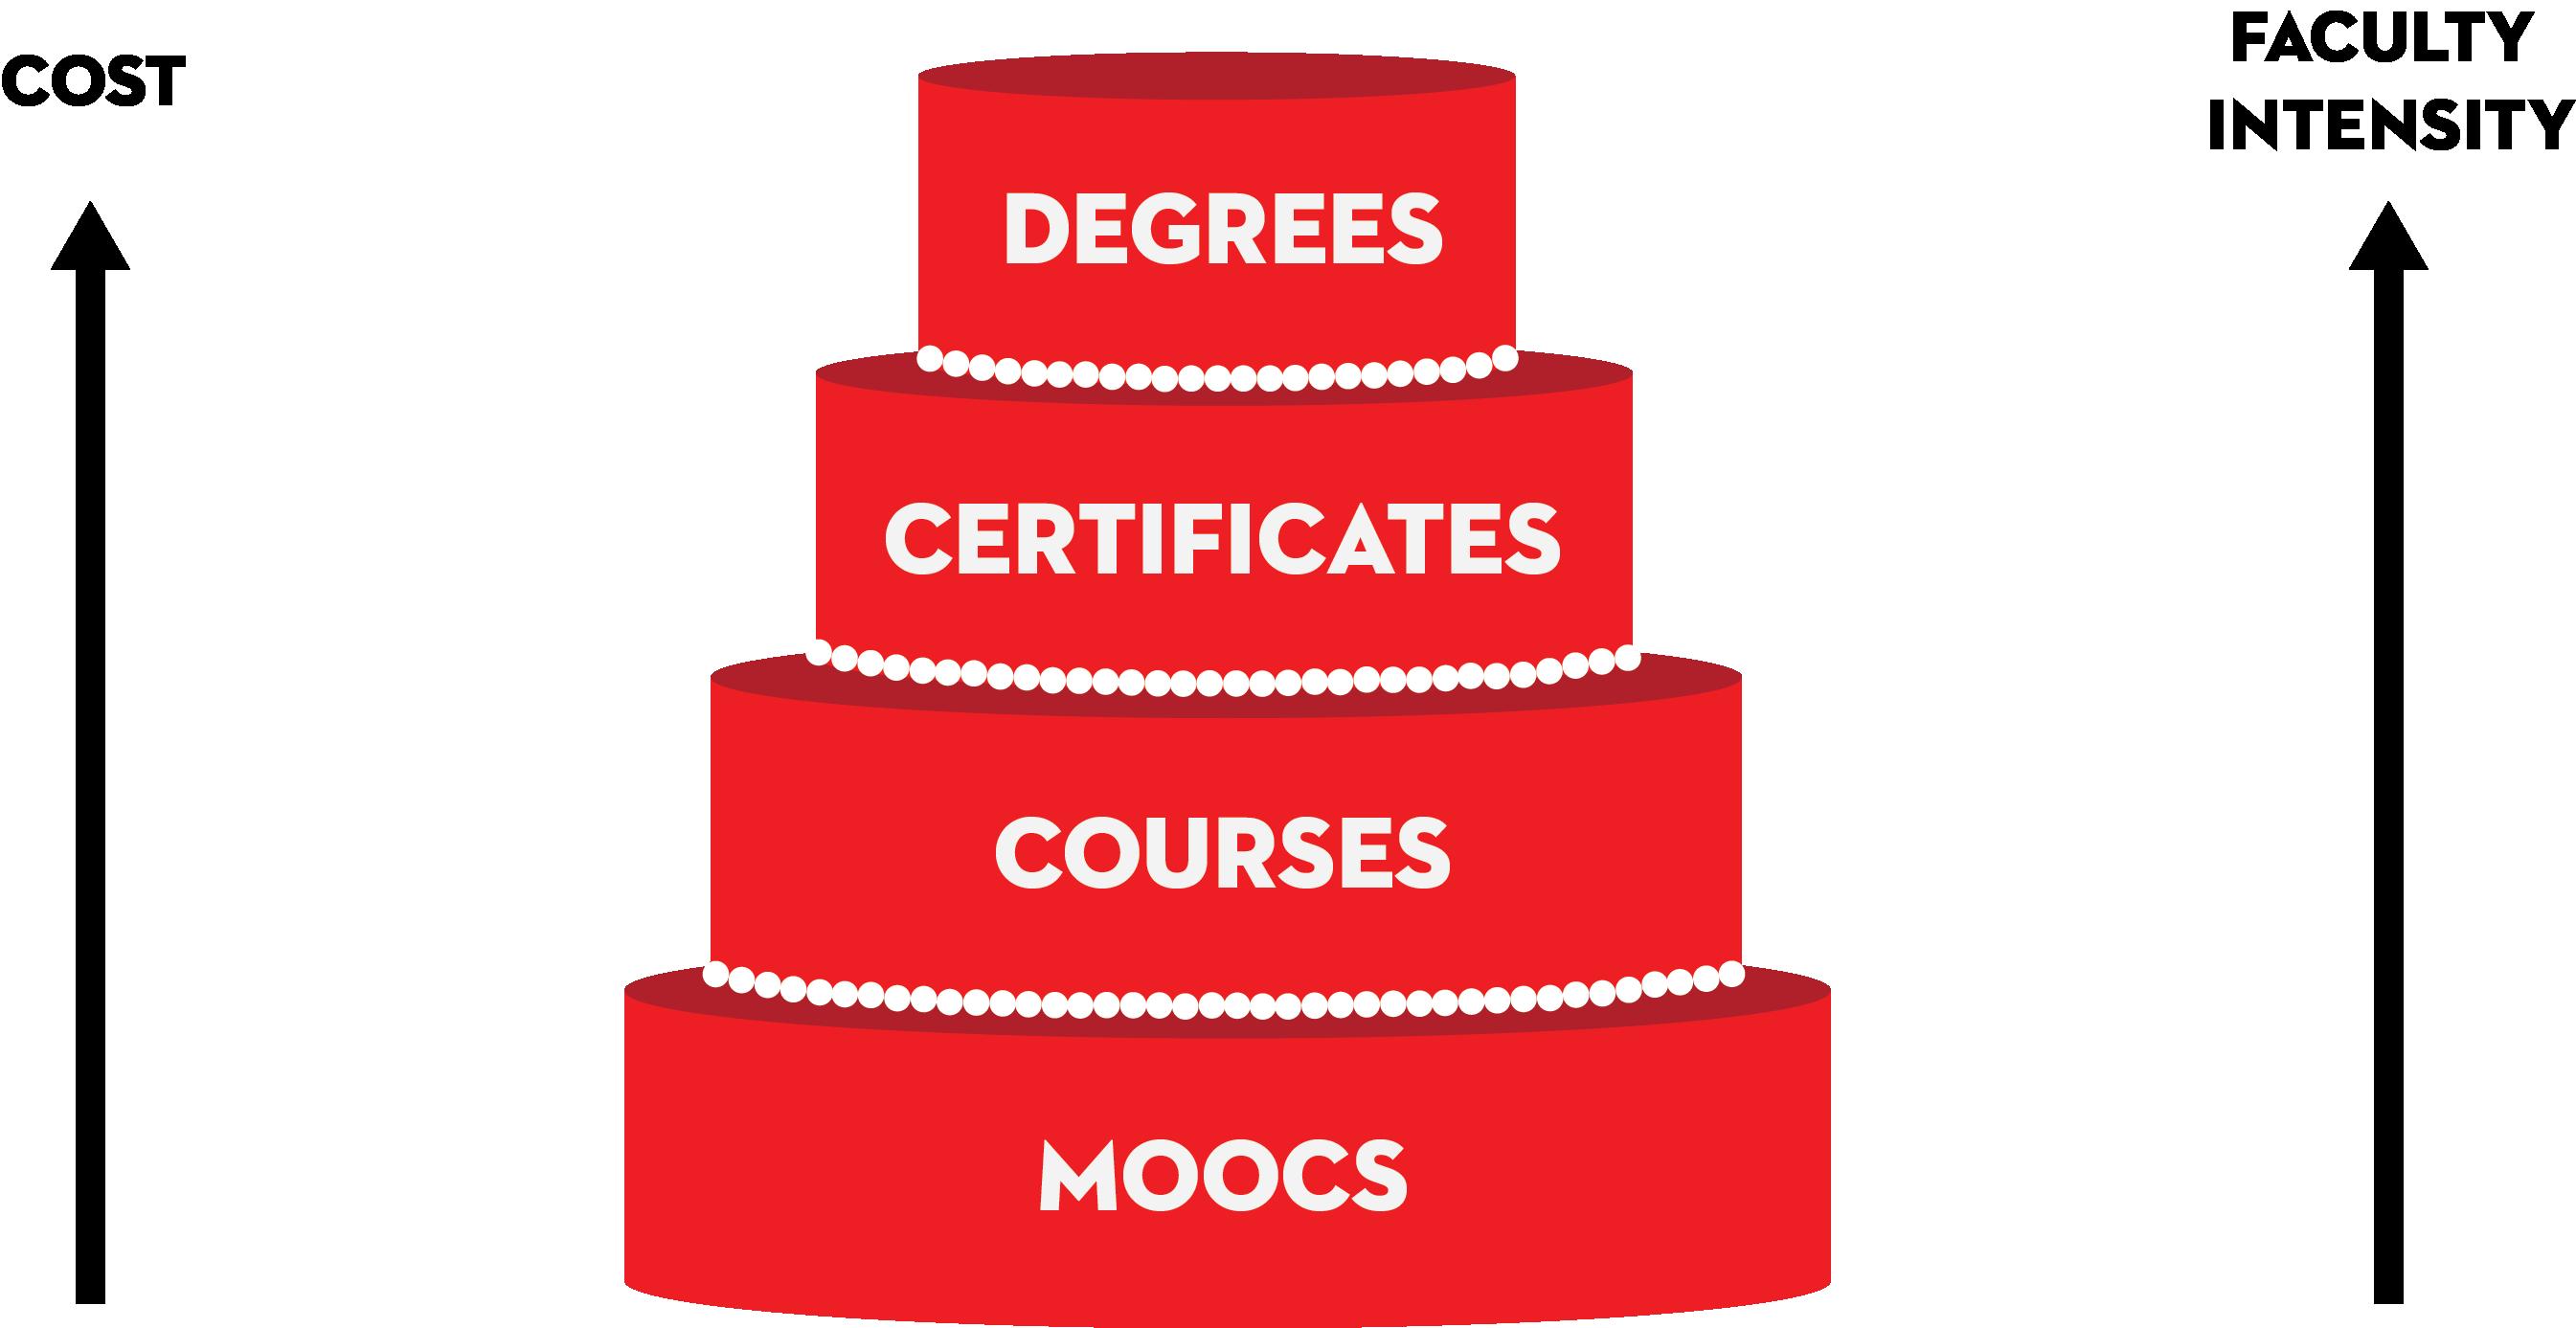 wedding cake mooc image